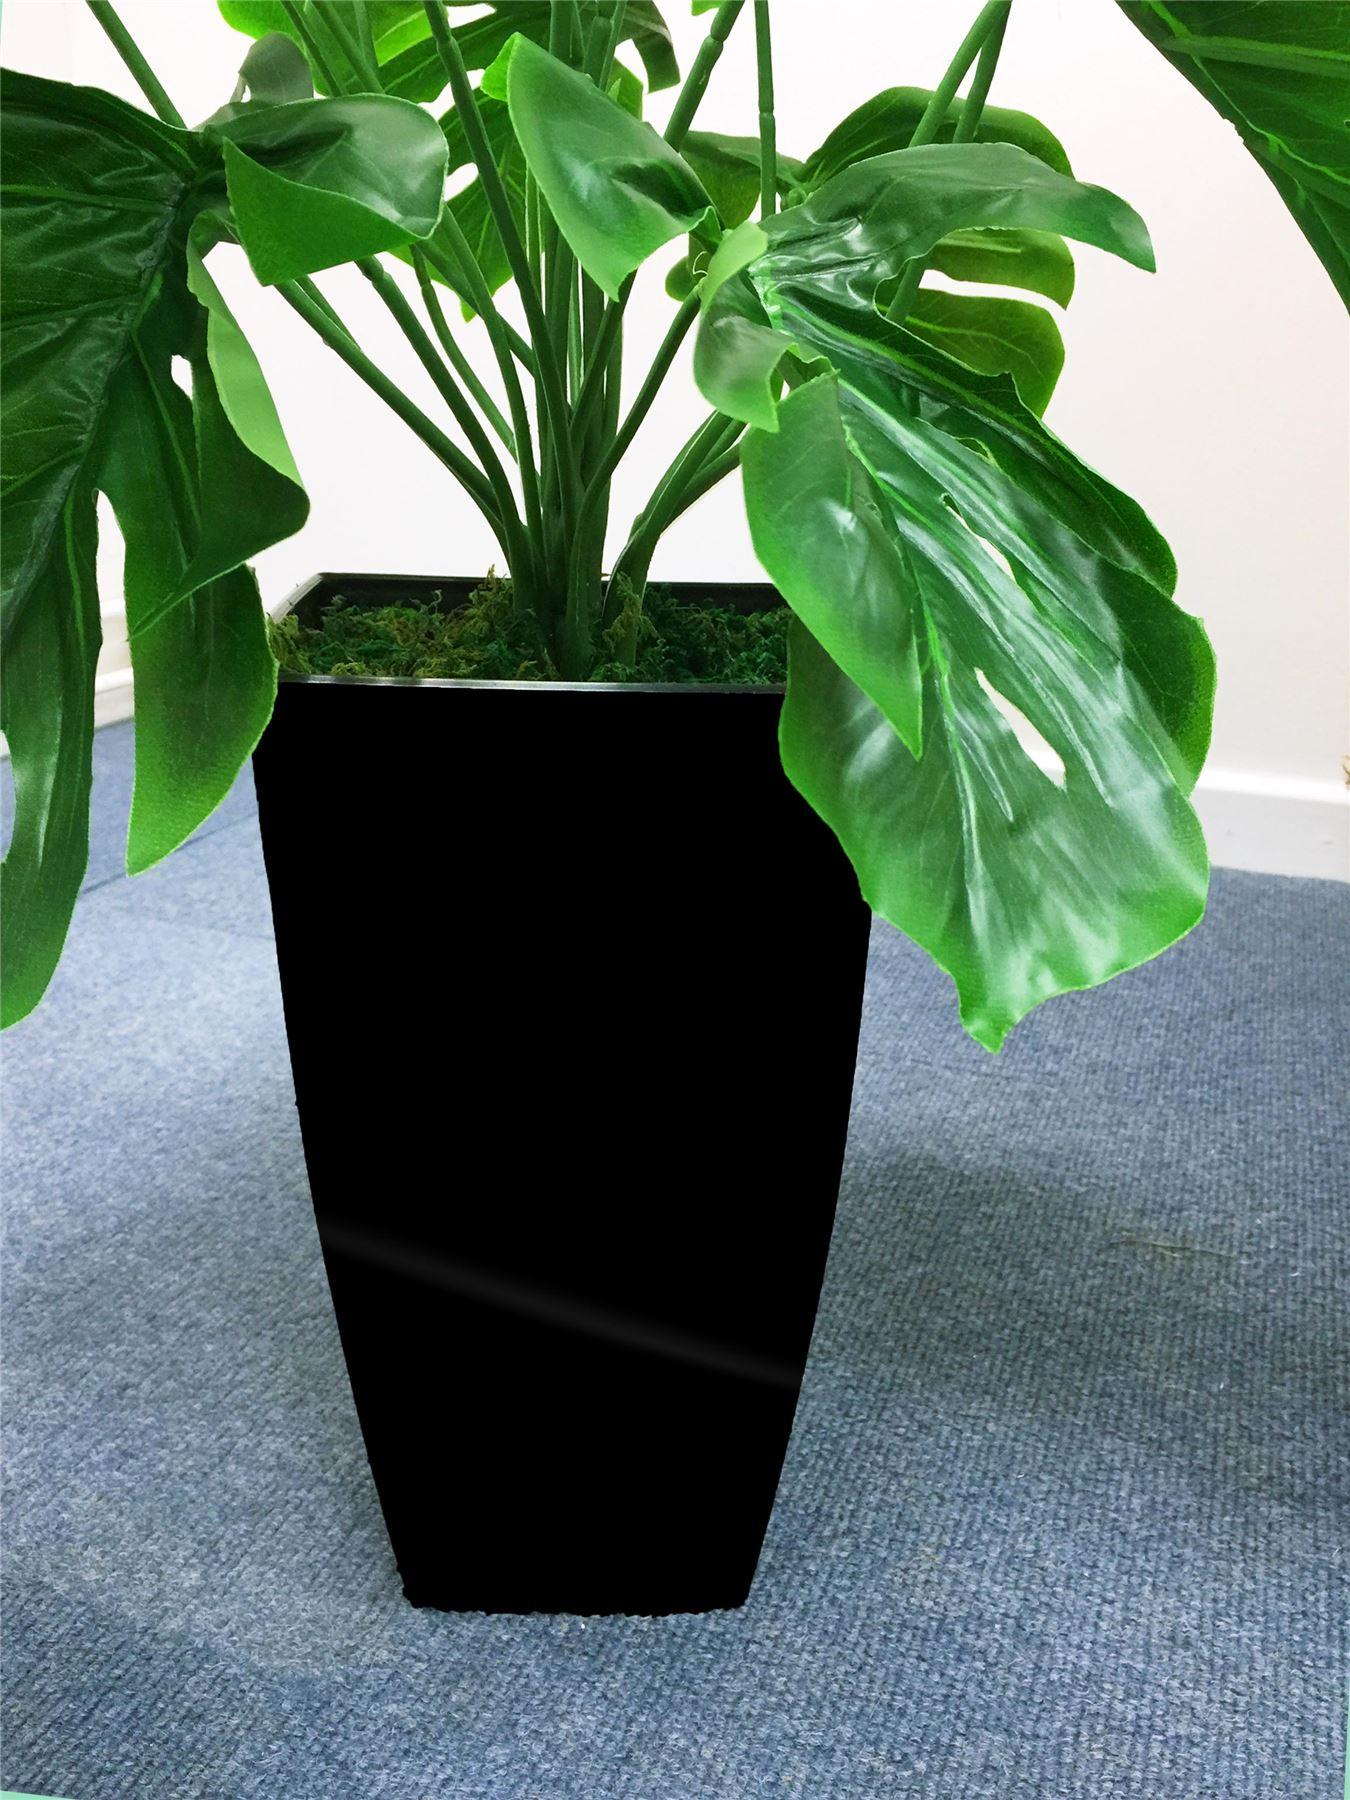 Arbre Artificiel cône spirale twist topiaire ball fig baie pieds rose 3 pieds baie 4 pi bureau usine 8b7ad0